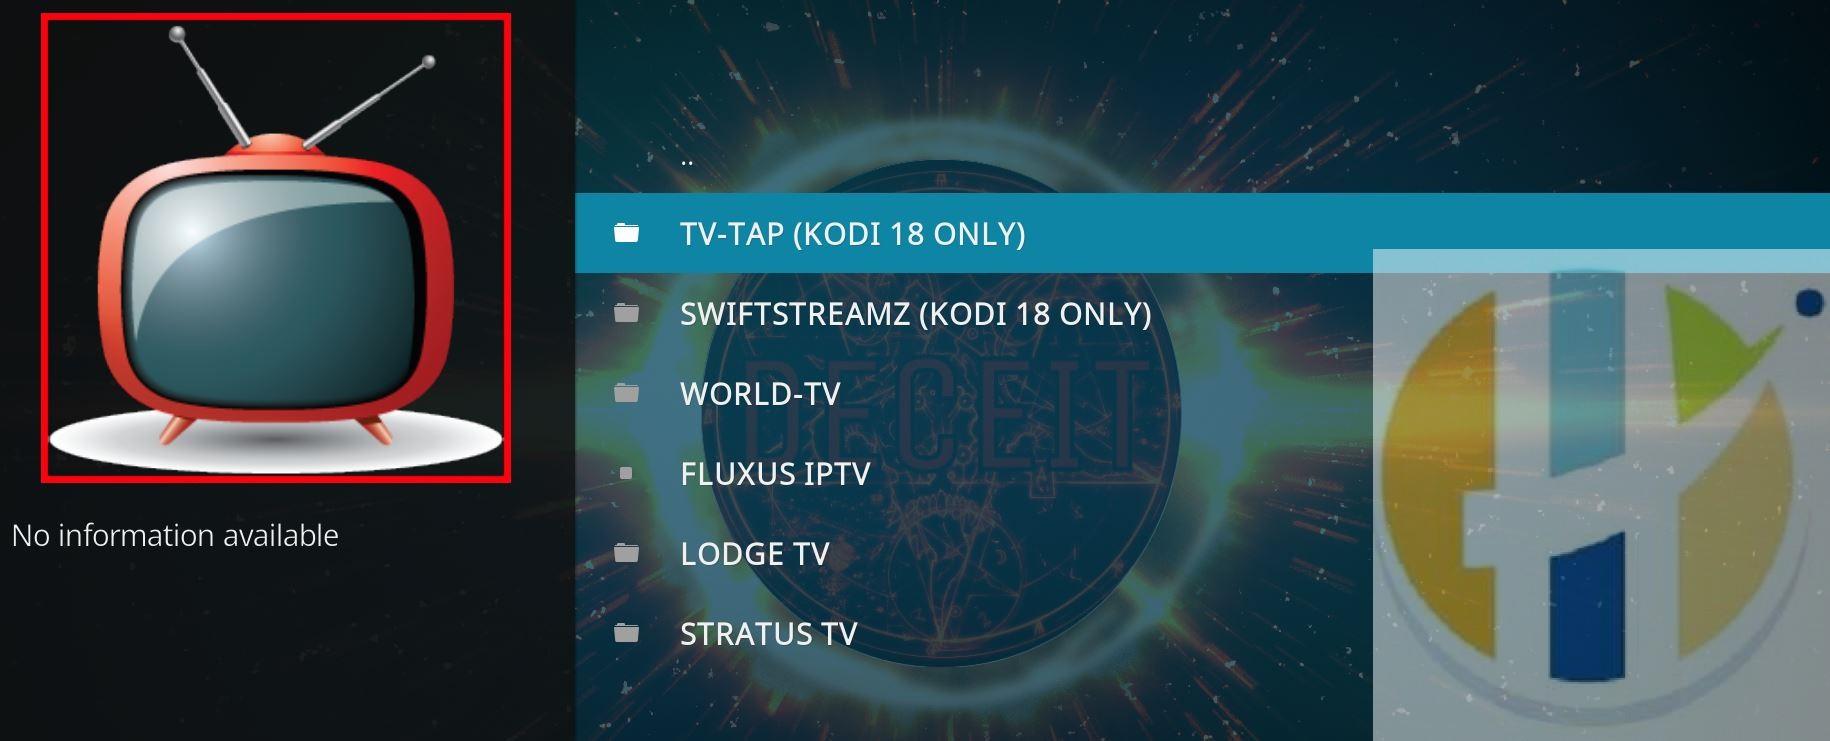 DECEIT Addon KODI 18 - IPTV Movies TV Shows - Husham com Kodi Addons